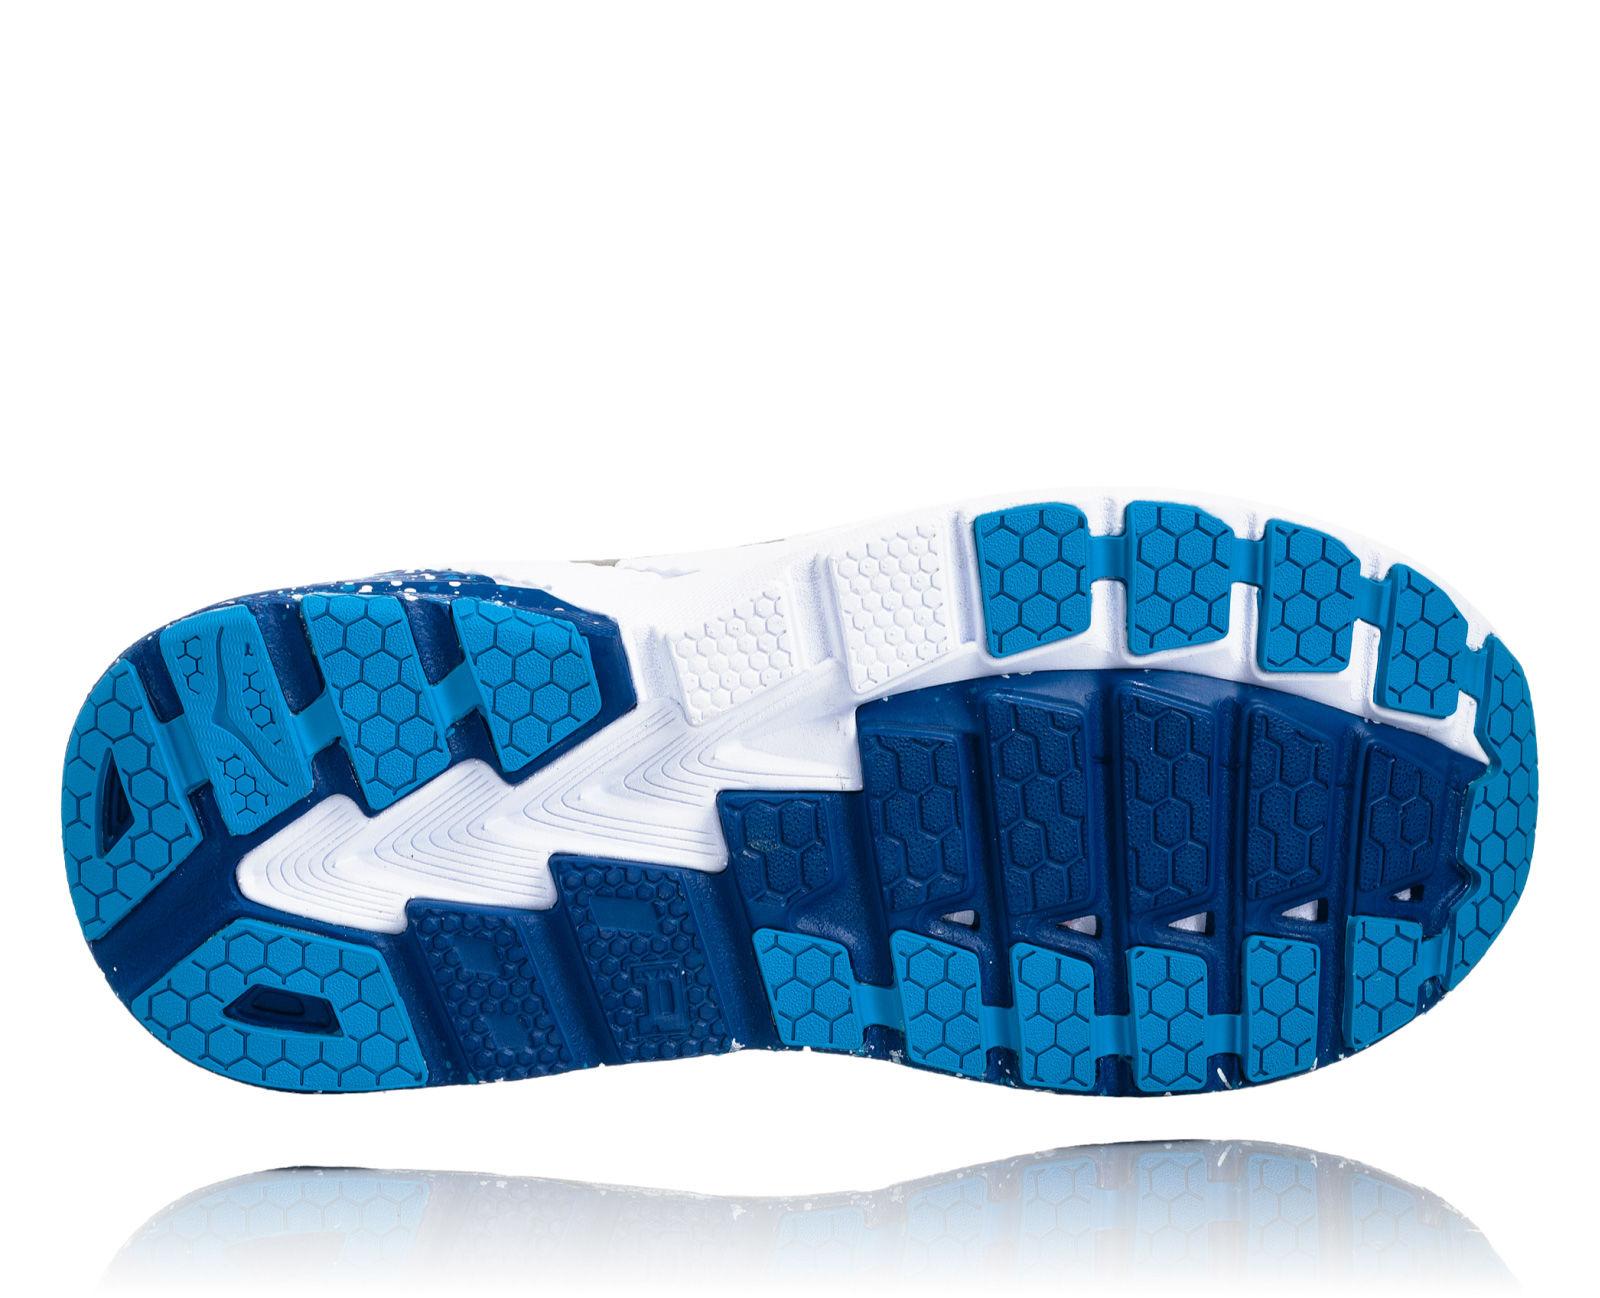 Кросівки для бігу HOKA ONE ONE (1016301) M GAVIOTA 2018 NMDN-niagara ... 7257374fbb446